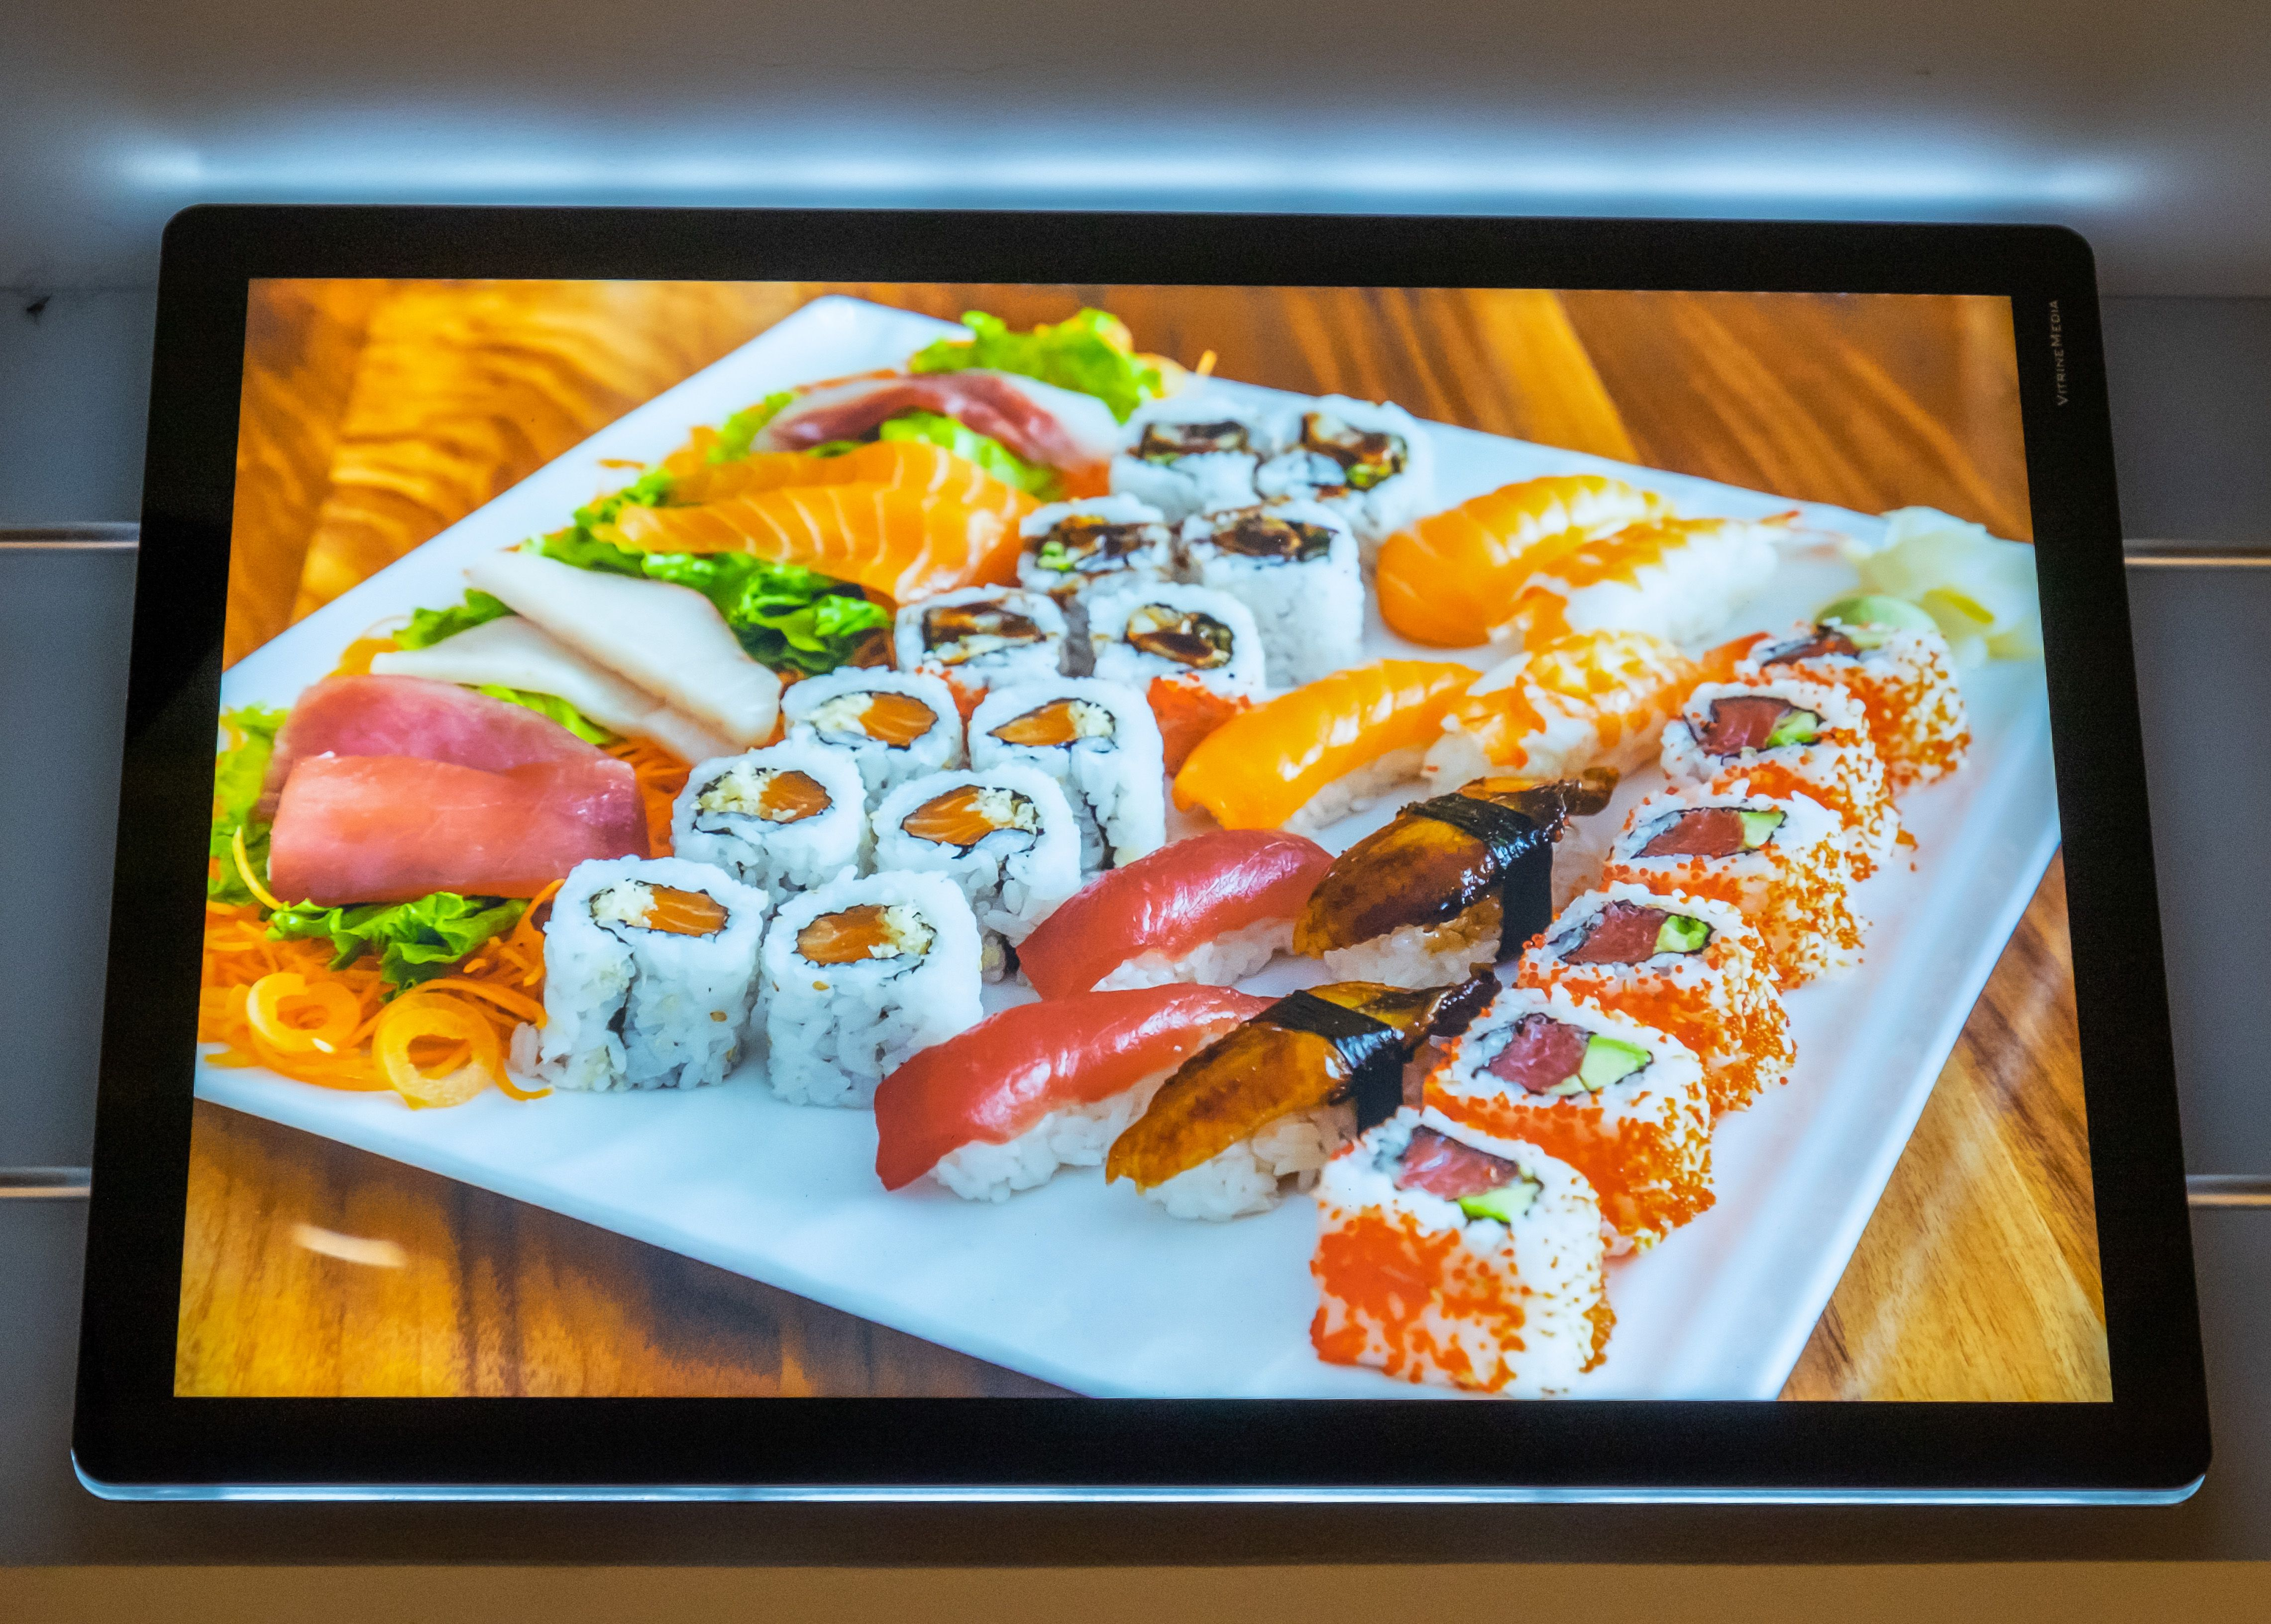 Astounding Foto 19 De Restaurante Buffet Libre En Dani Liu Download Free Architecture Designs Meptaeticmadebymaigaardcom